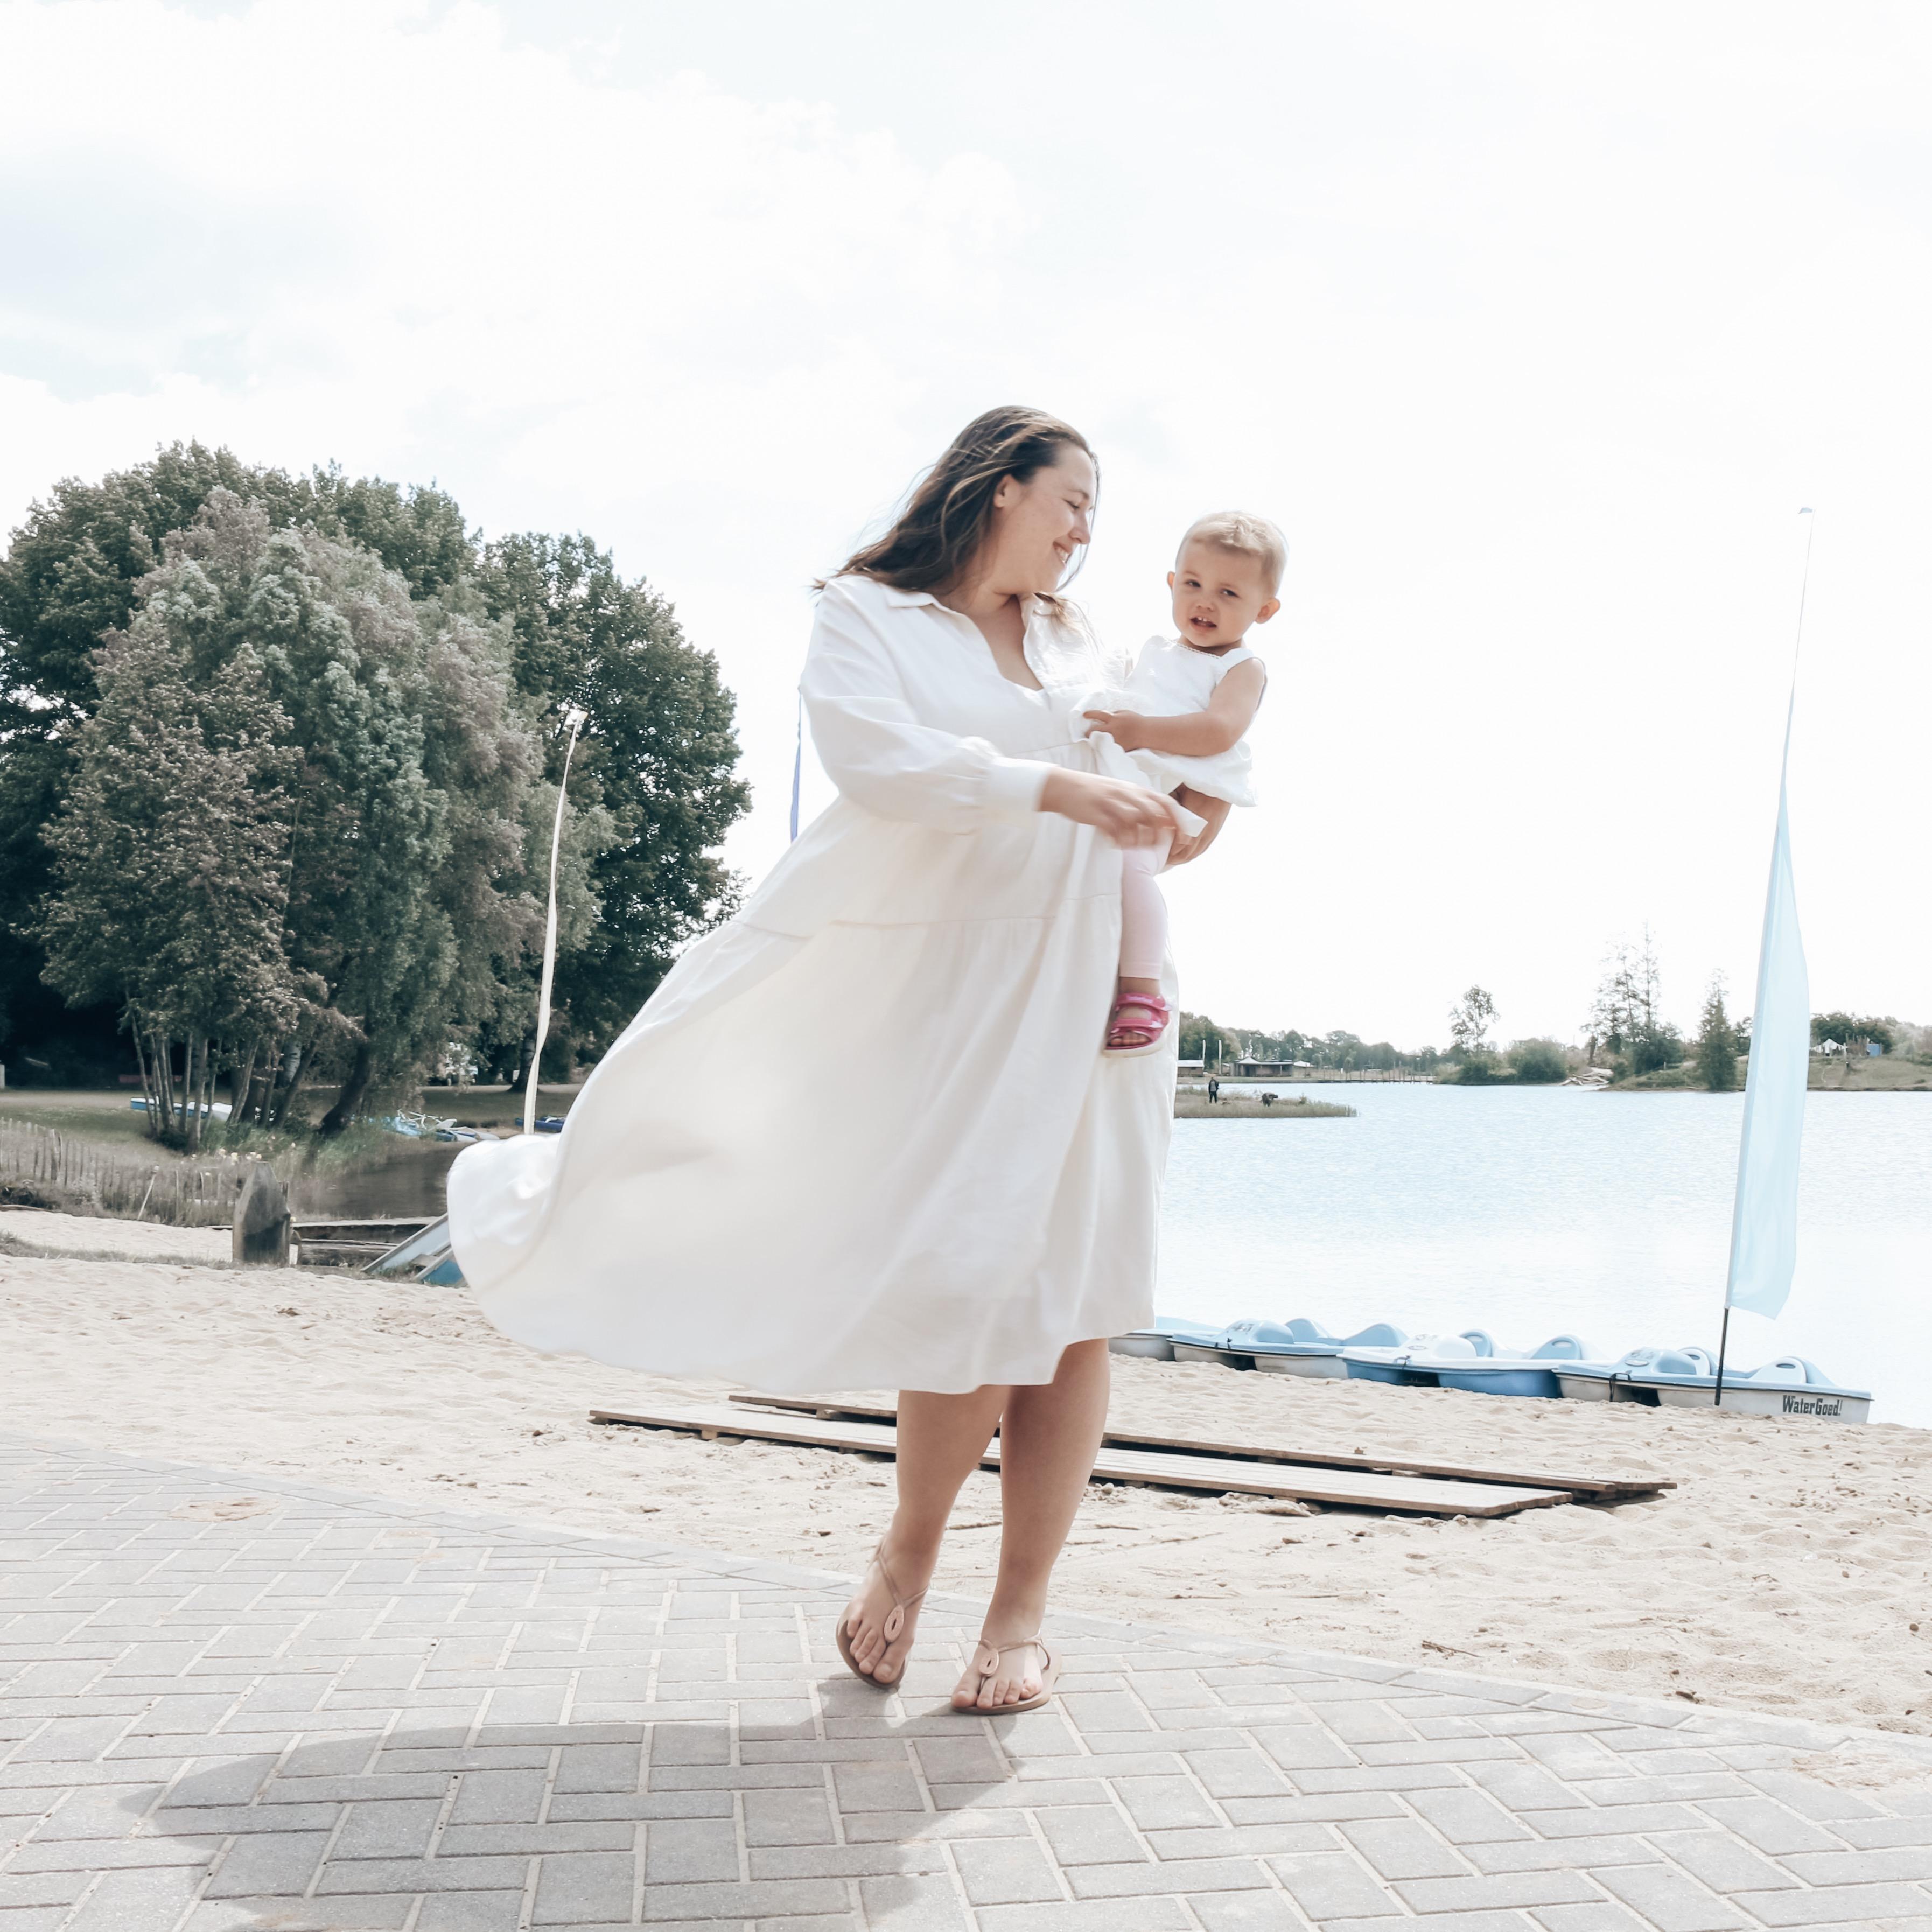 Dingen die je beter niet kan doen in witte kleding witte jurken